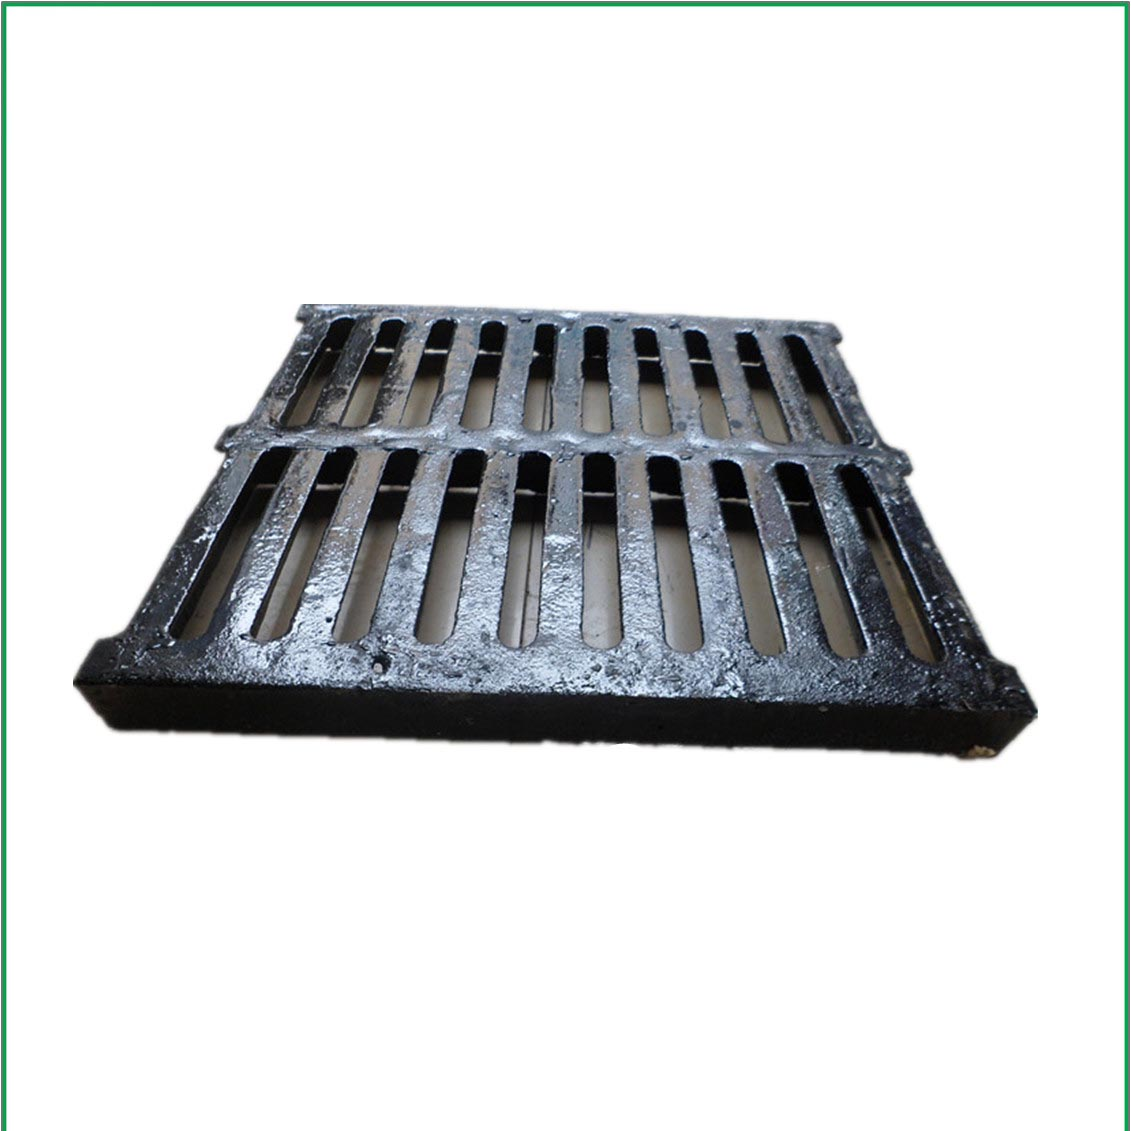 Nodular cast iron manhole sewer grate ditch cover rain drain ditch cover kitchen trench cover 500*50